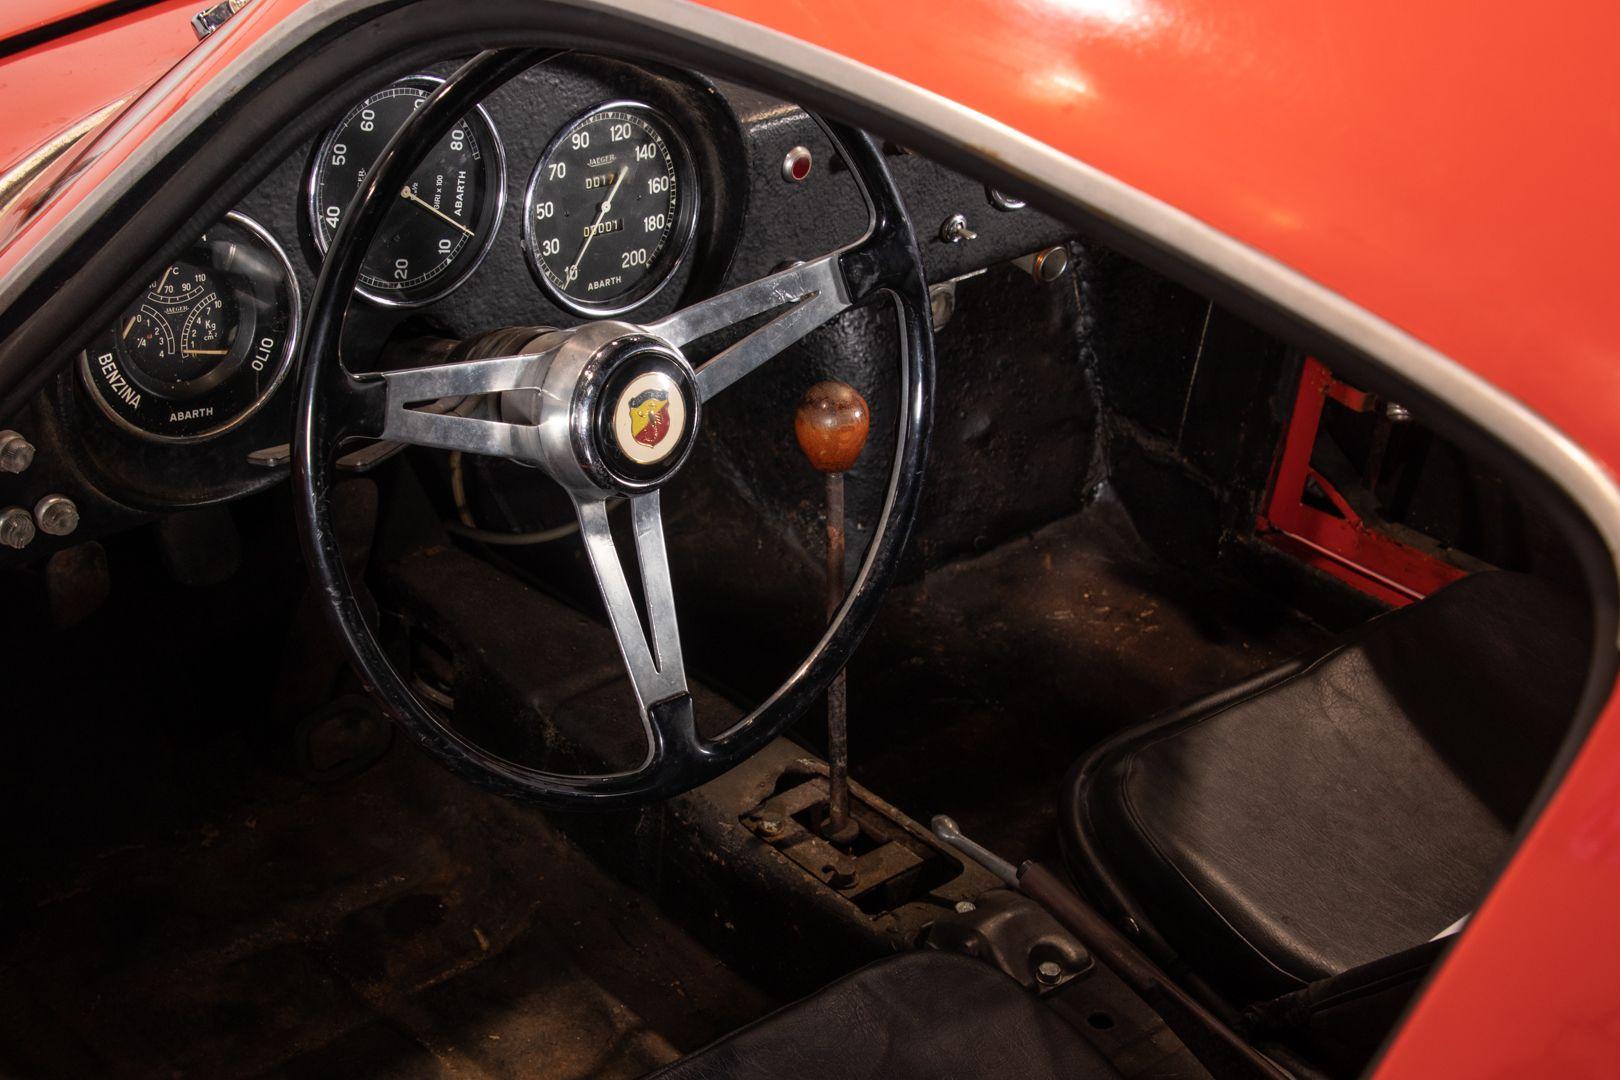 1960 Fiat Abarth 750 Bialbero record Monza 33332